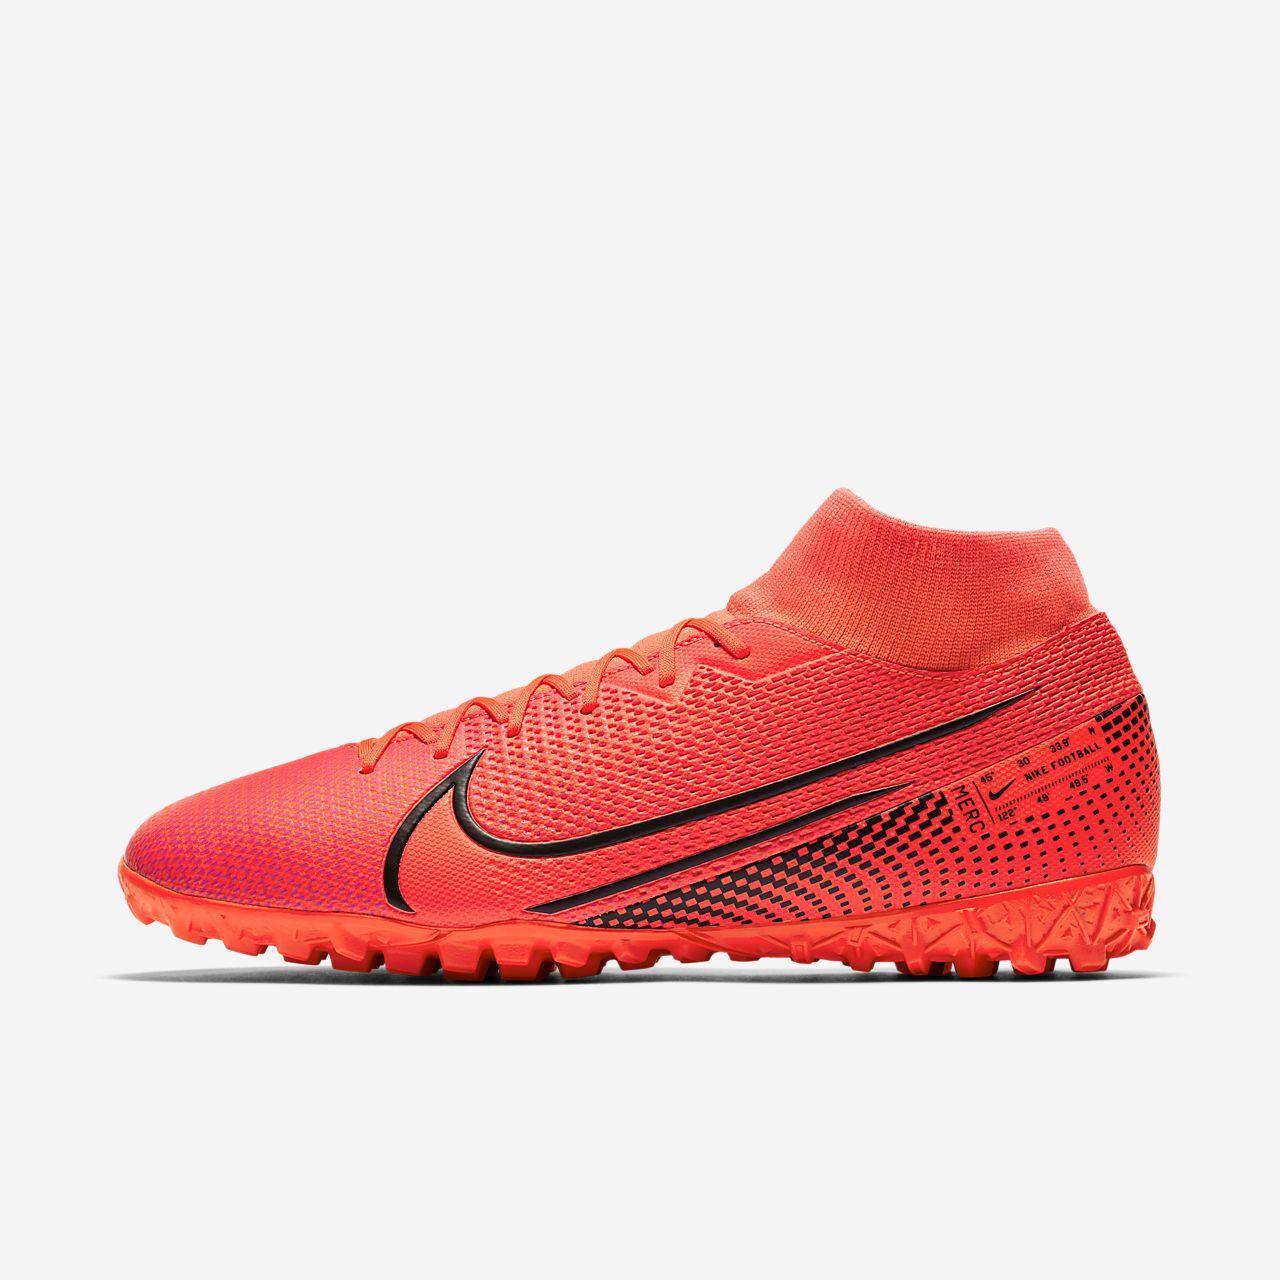 Nike Superfly 5 : Buy Nike Shoes Online for Men & Women